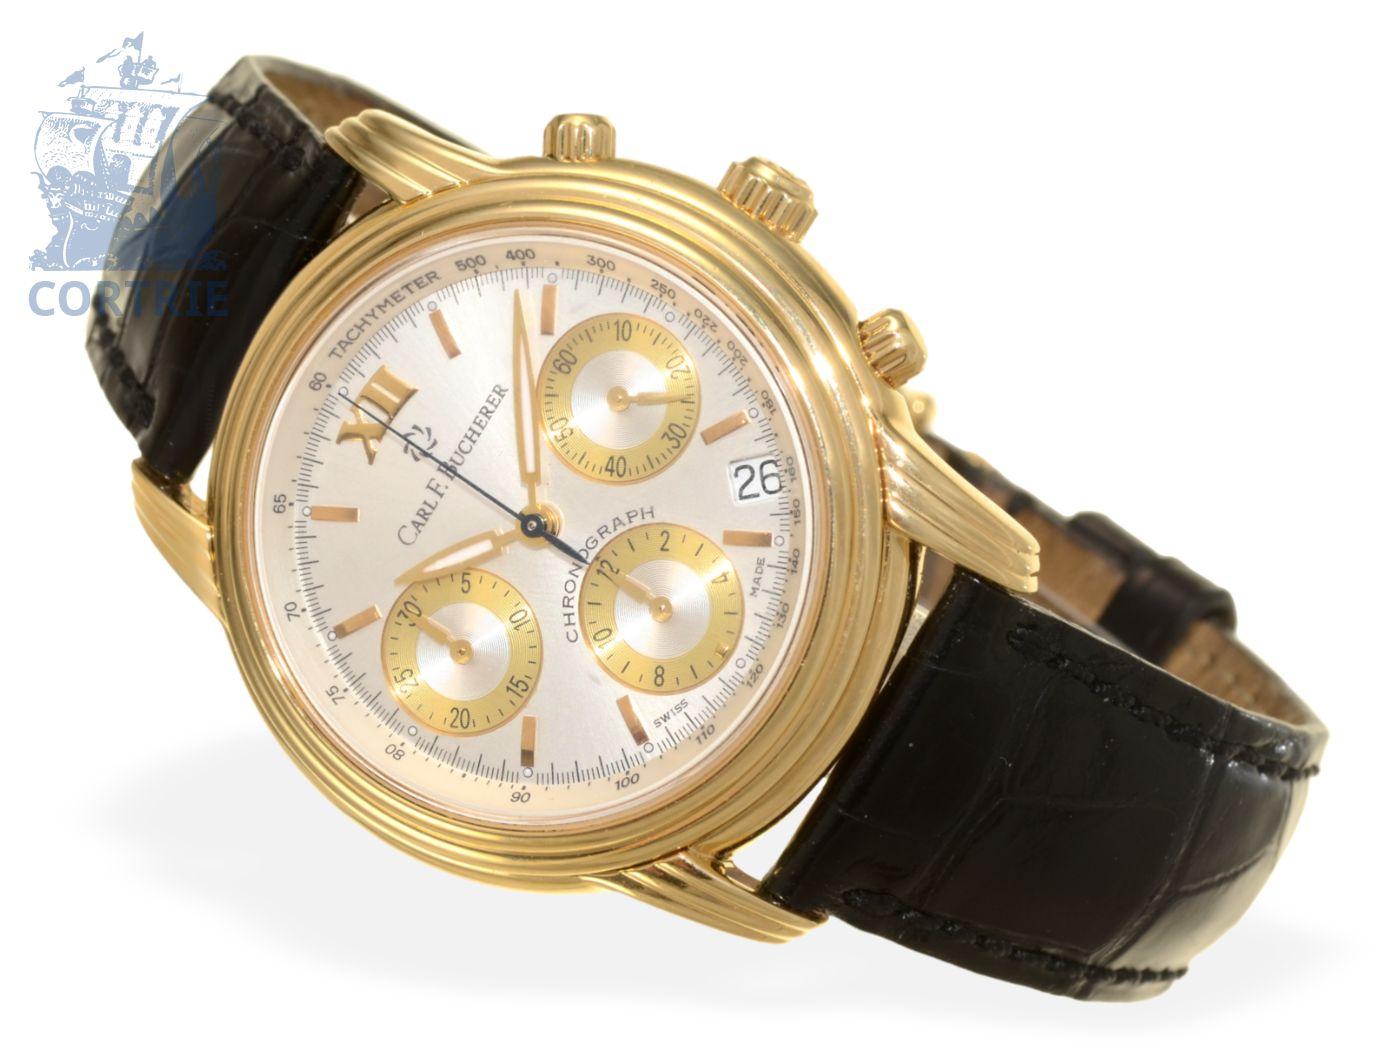 Wristwatch: luxurious automatic chronograph Carl F. Bucherer Archimedes, 18K pink gold, cal. 2894-2-